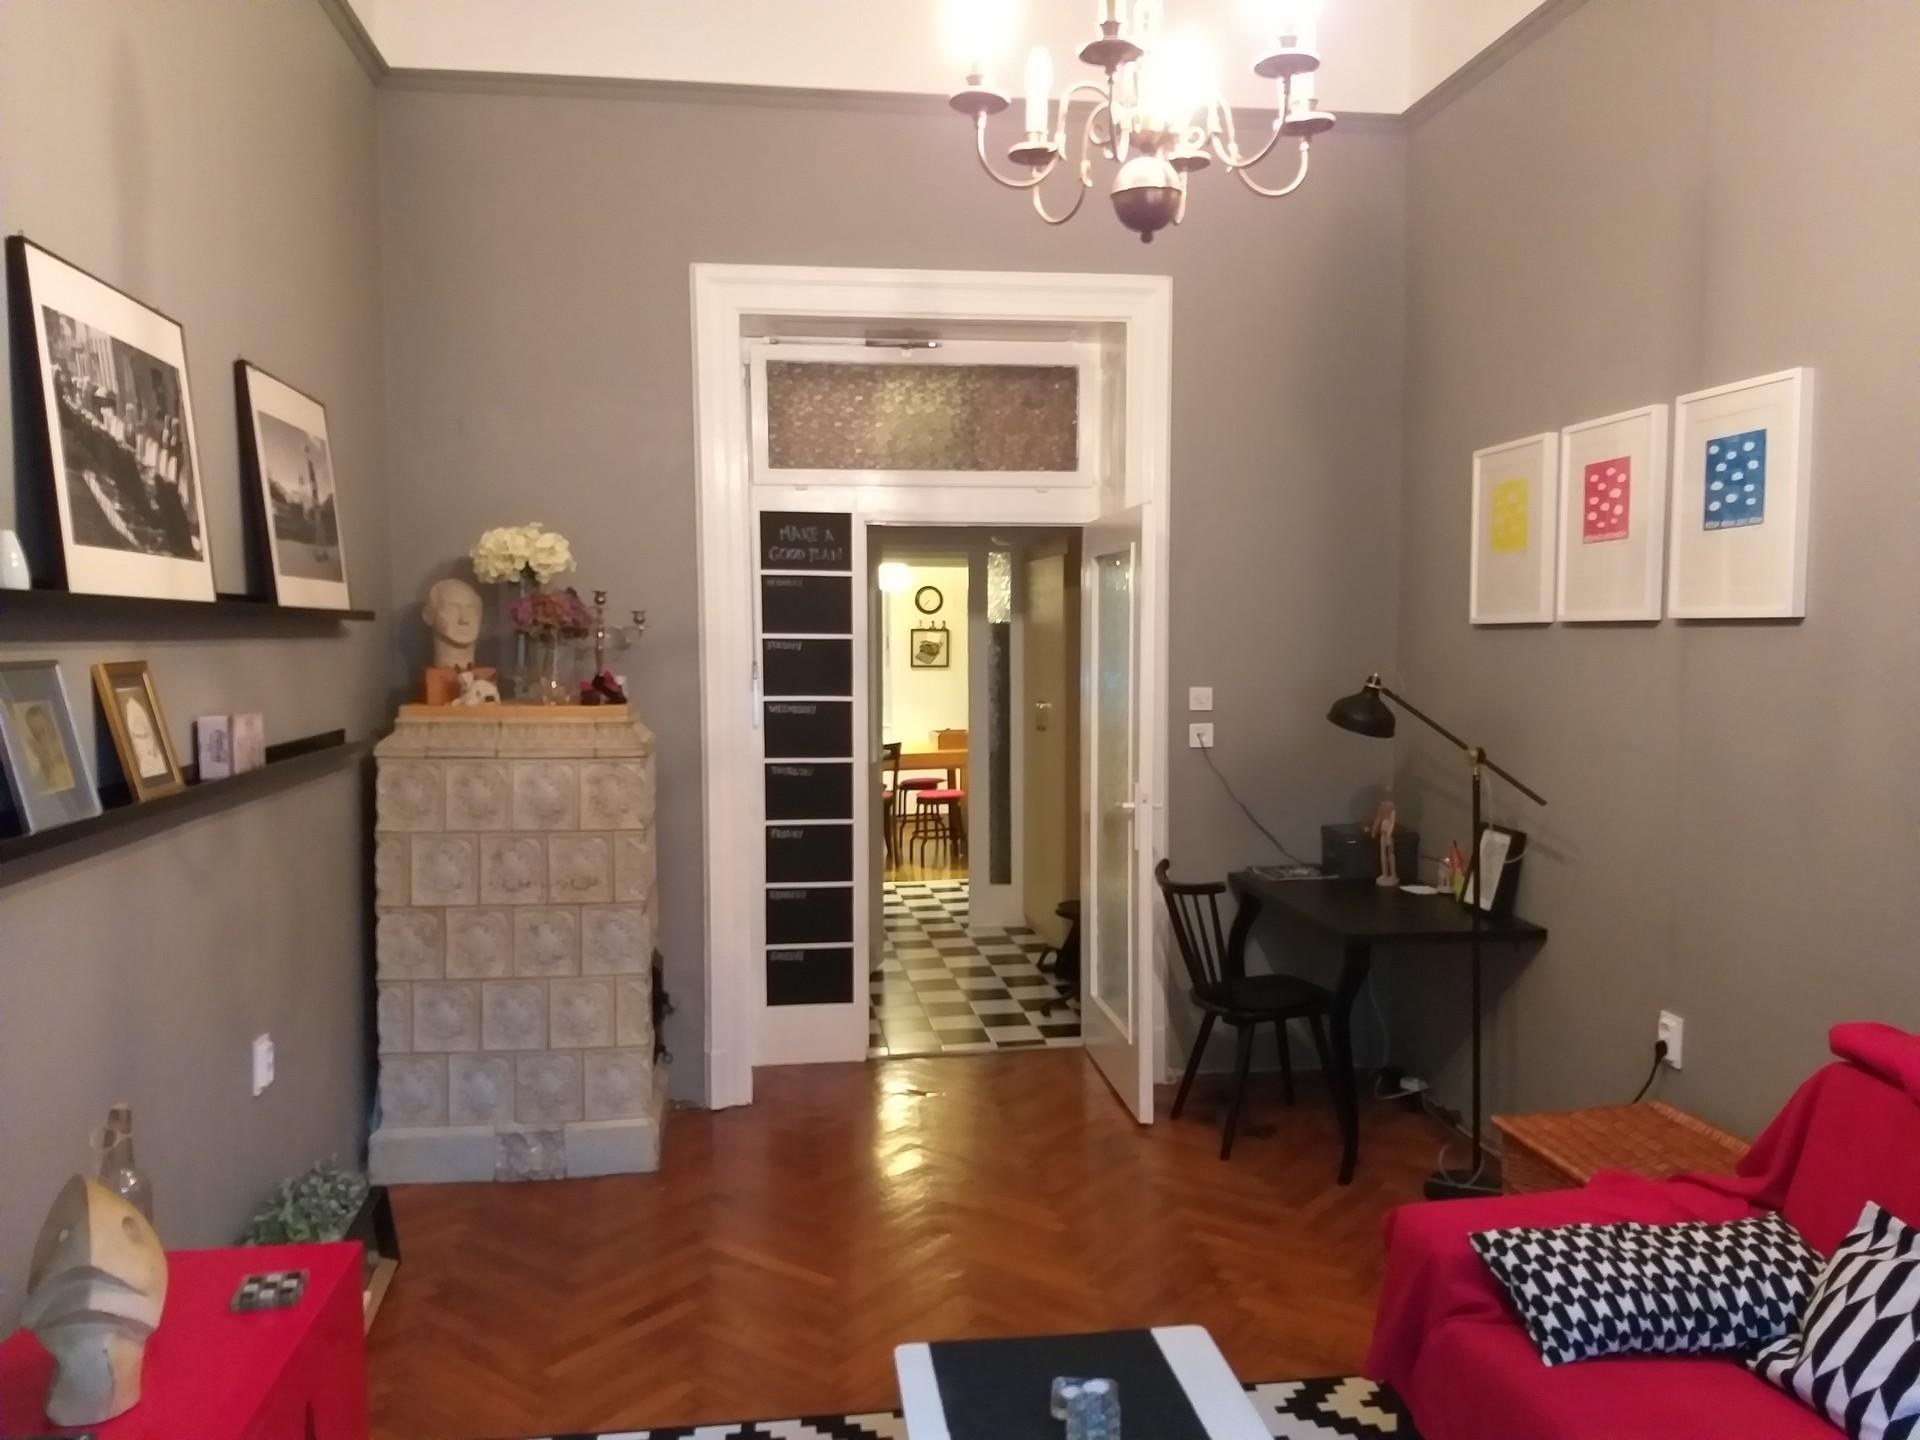 Apartment for 2 near center (Designer District)